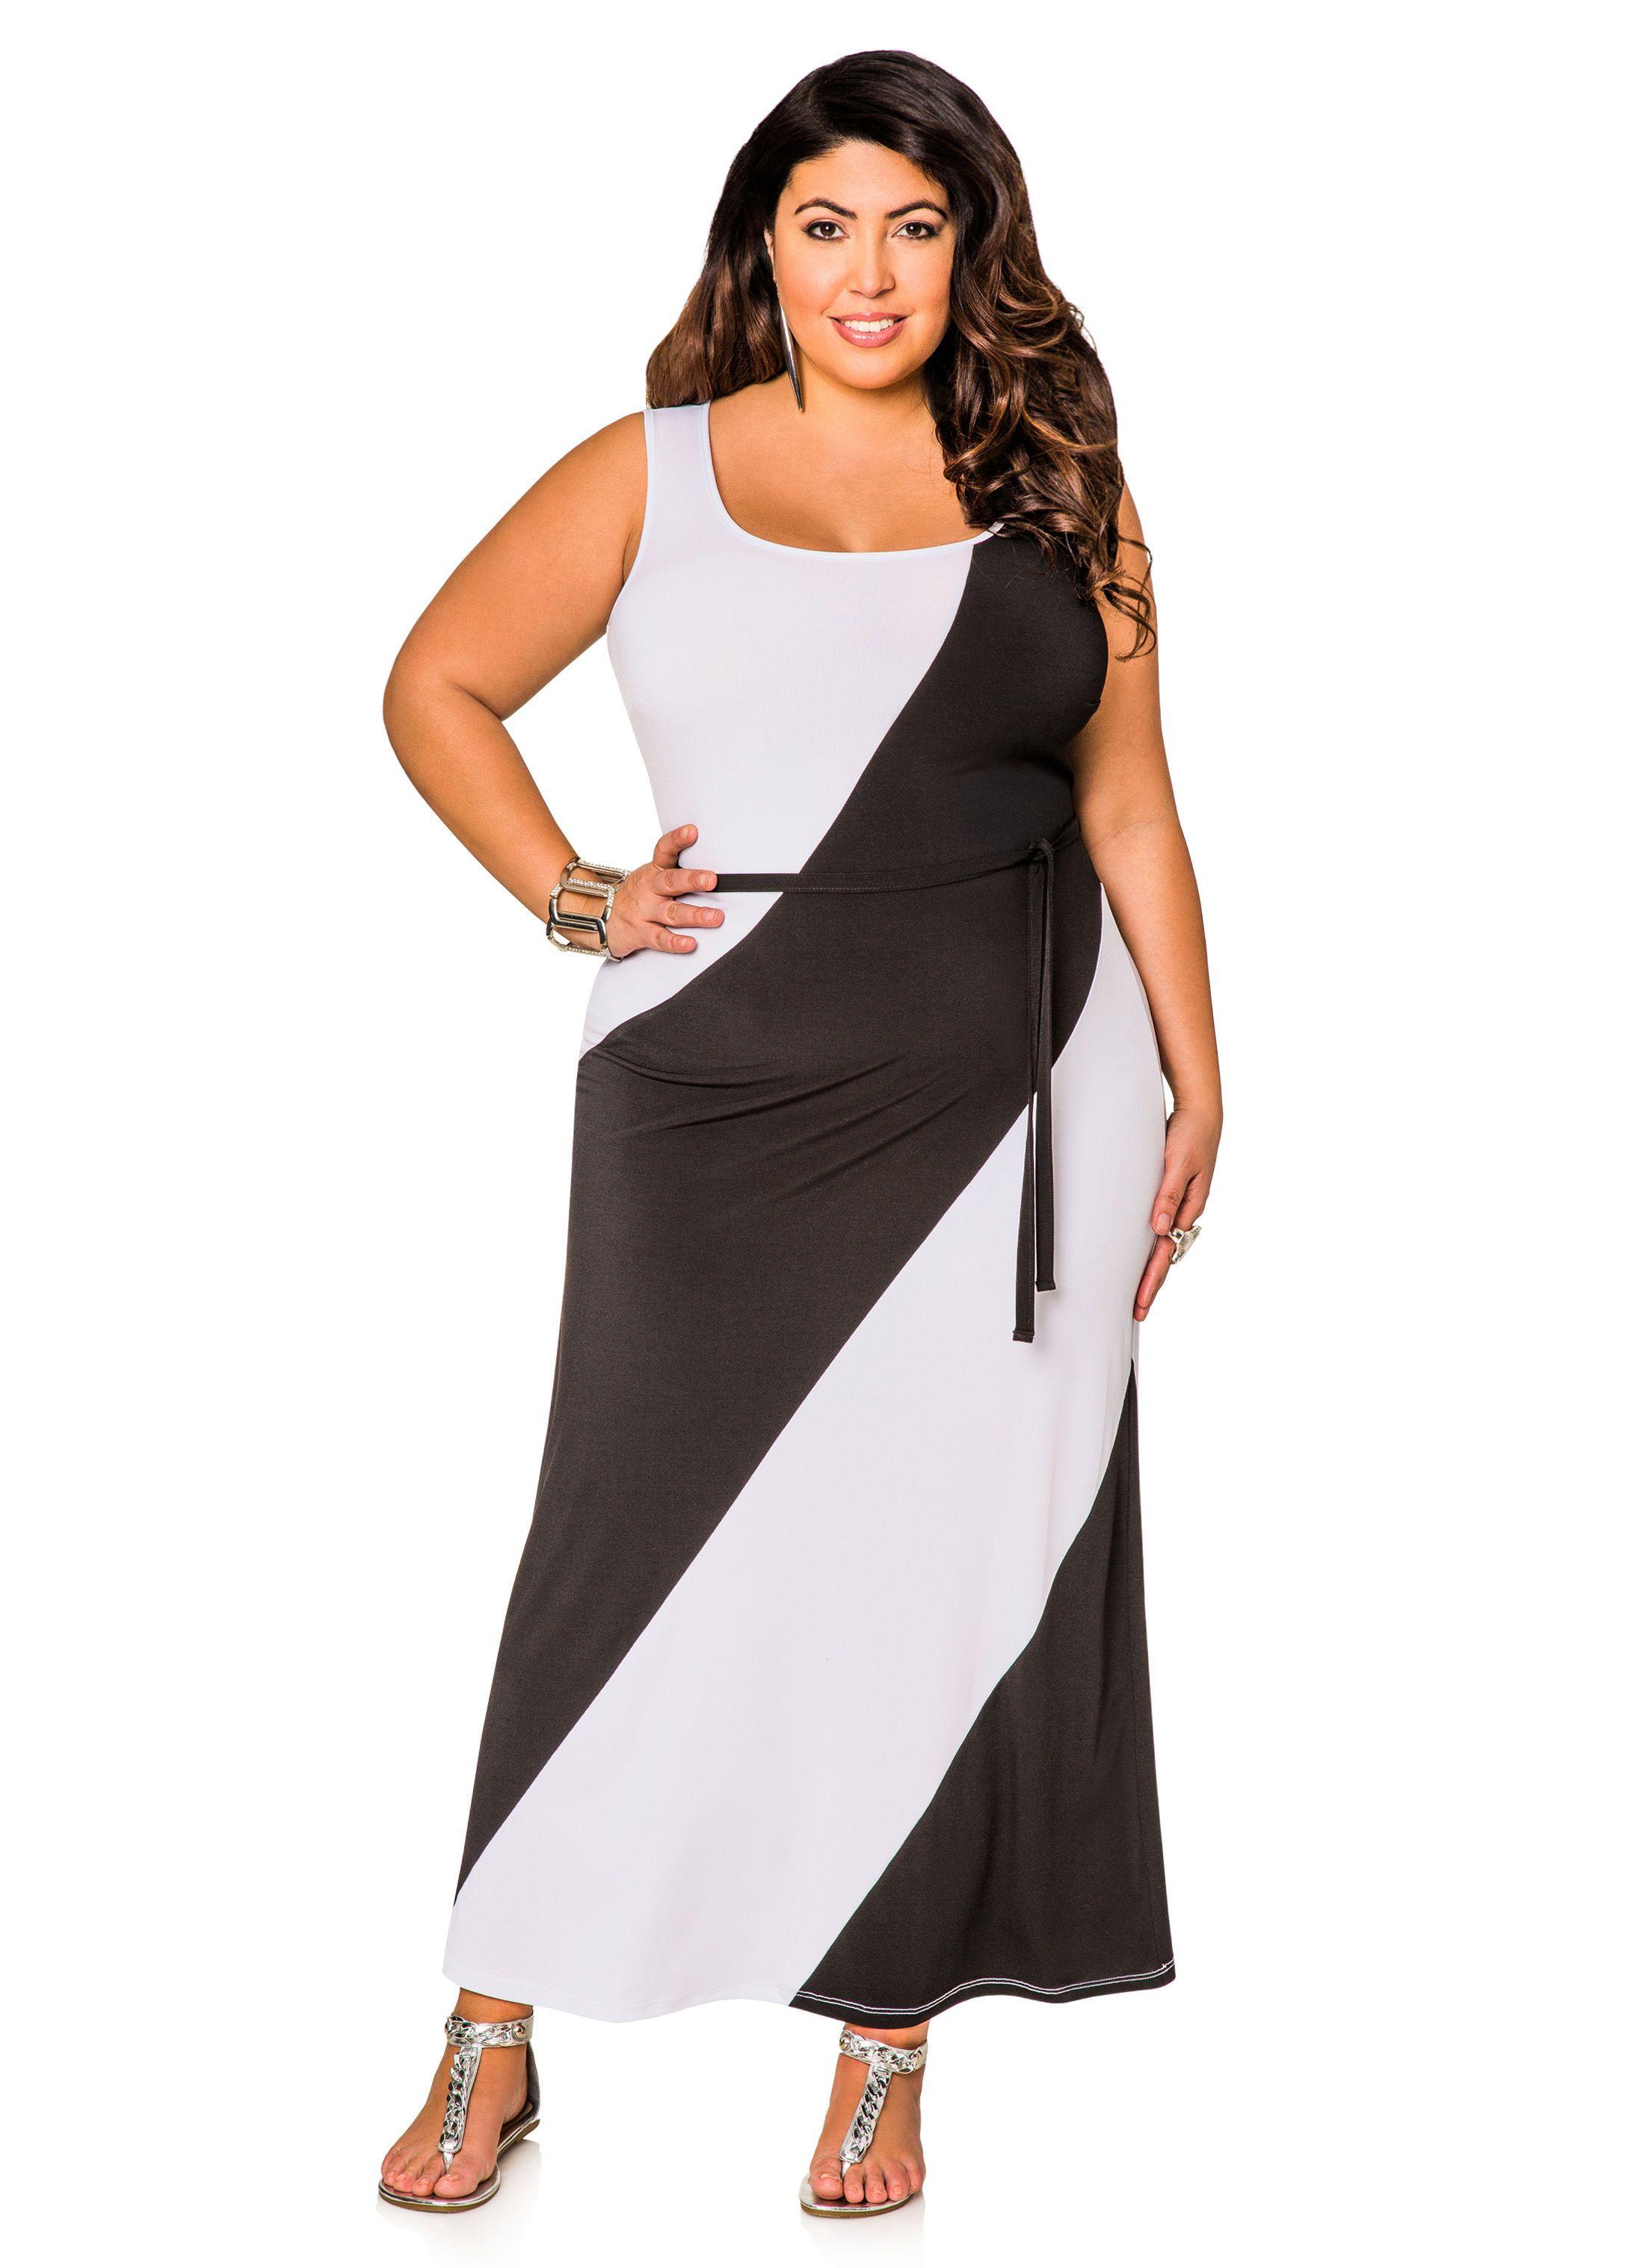 Diagnol Stripe Belted Colorblock Maxi Dress Ashley Stewart Color Block Maxi Dress Maxi Dress Shop Casual Dresses [ 3035 x 2178 Pixel ]